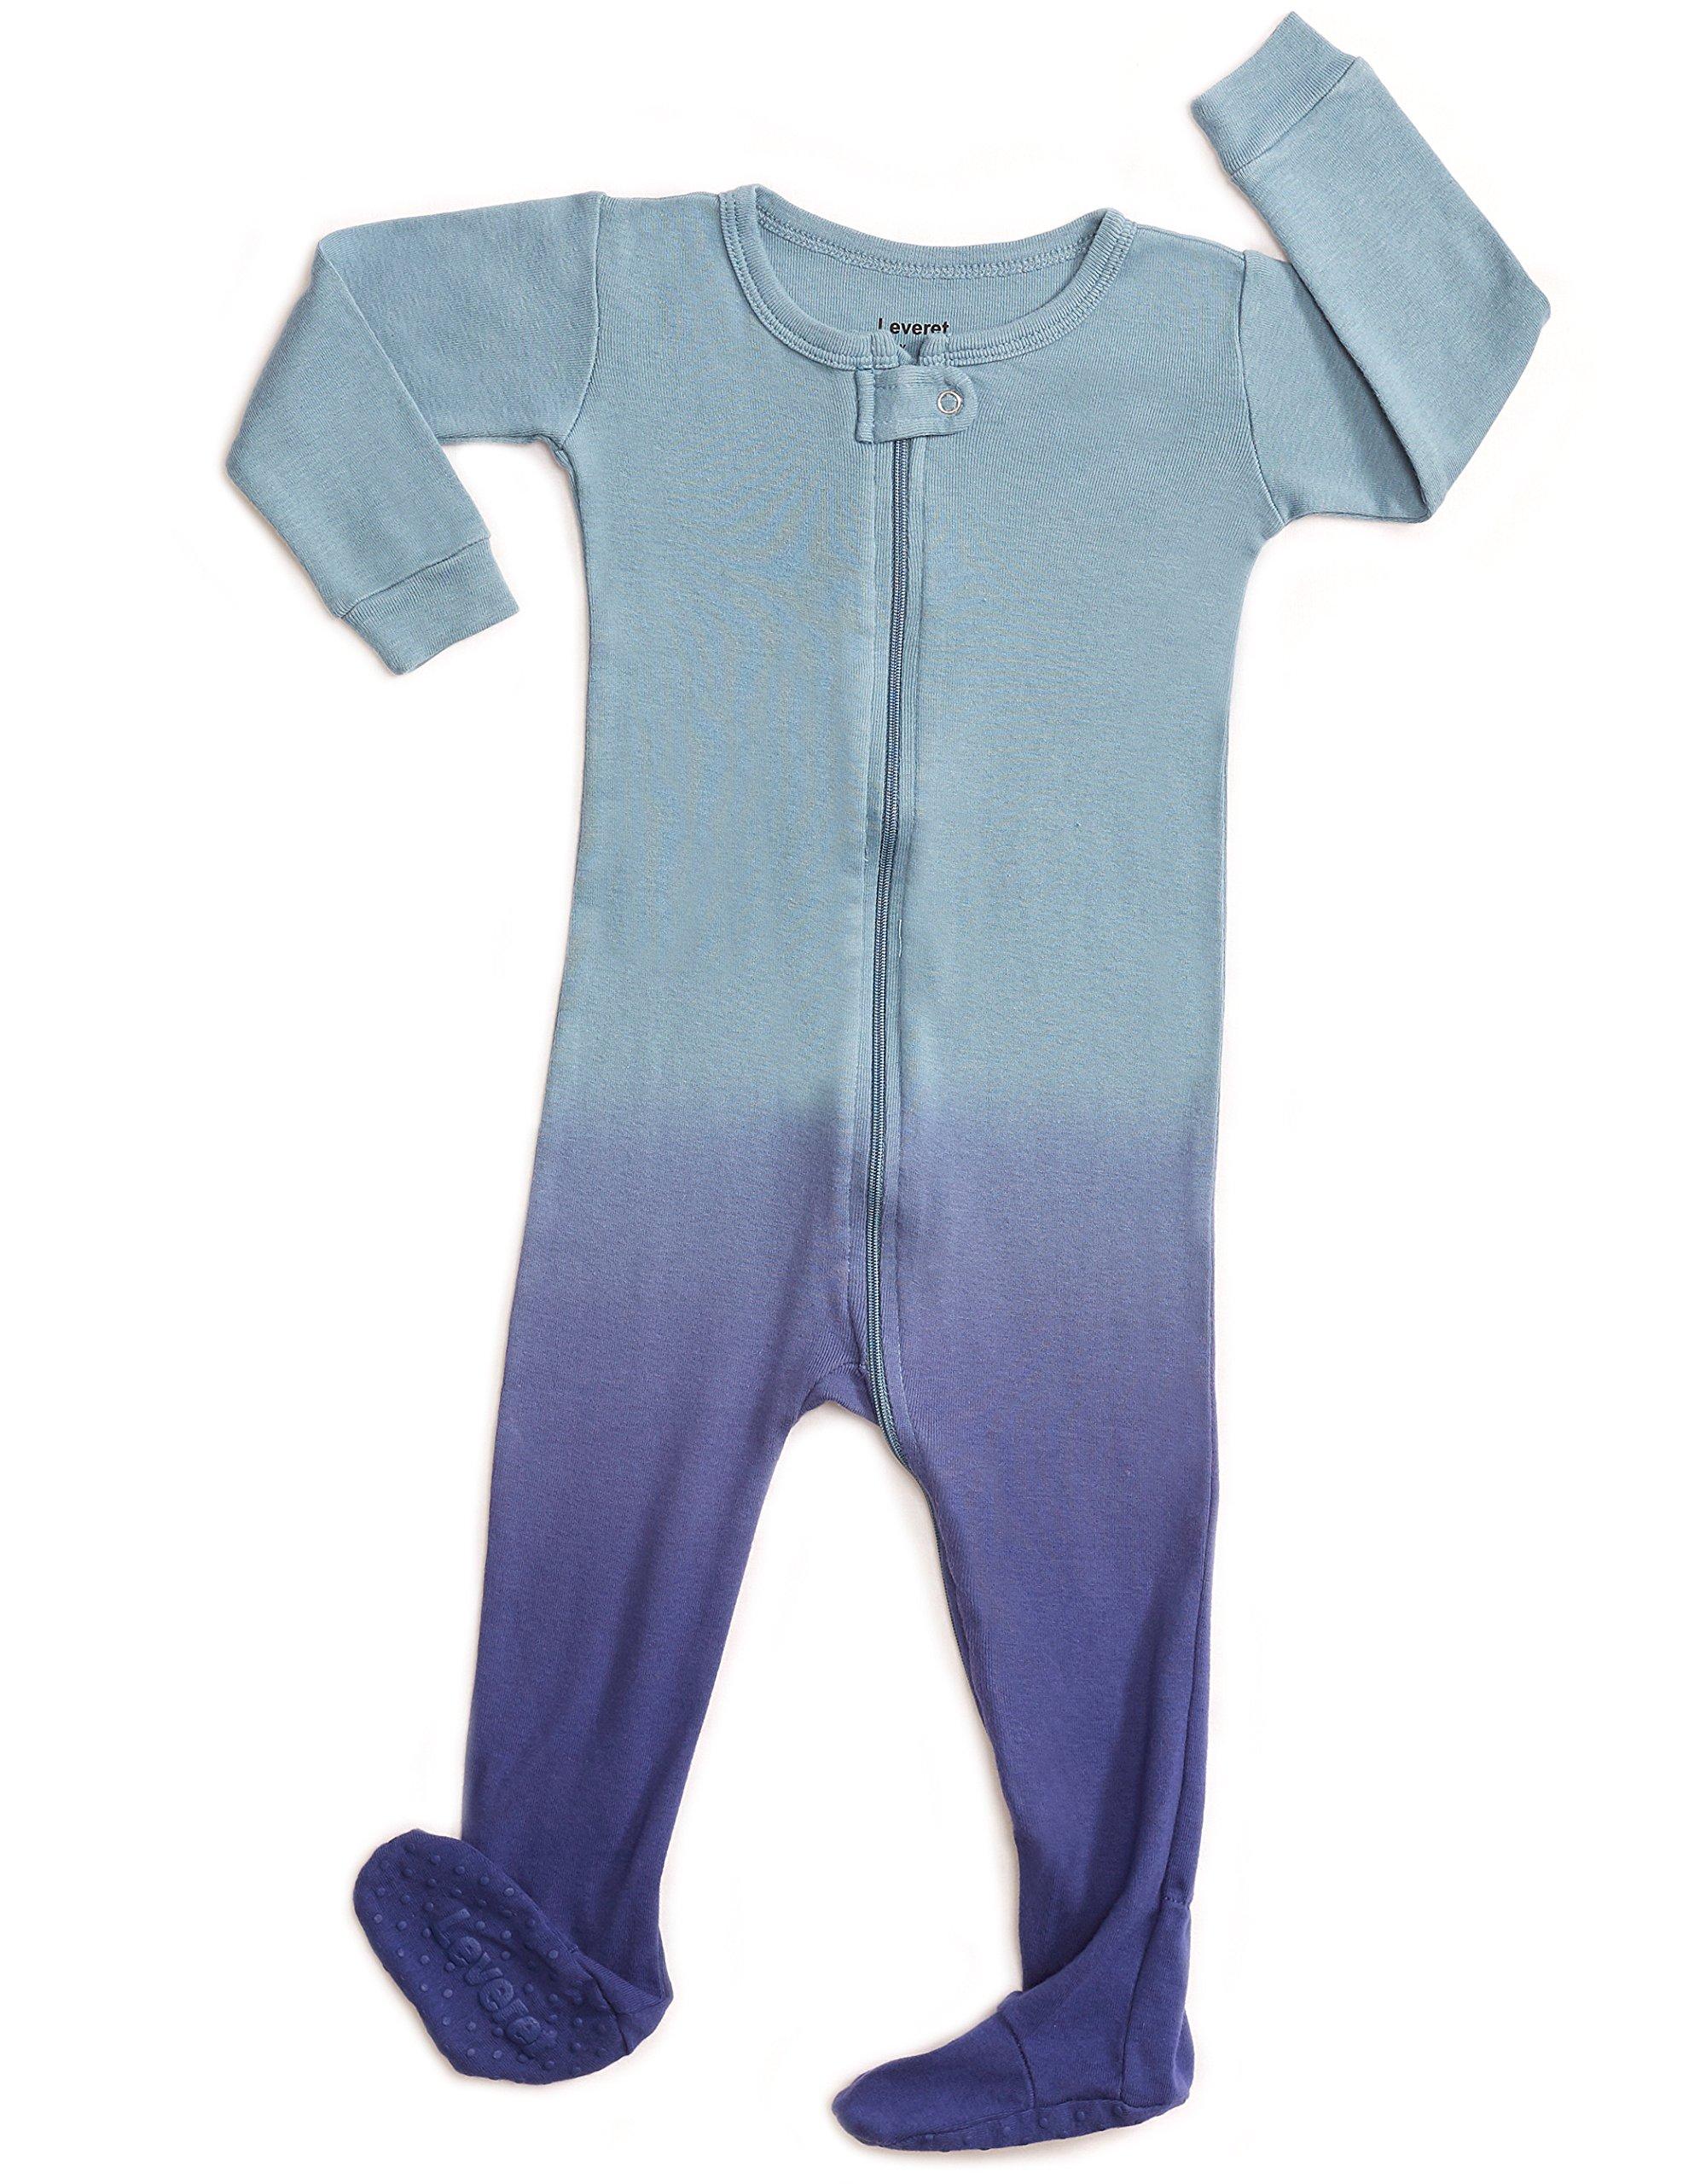 Leveret Organic Cotton Tie-Dye Blue Footed Pajama Sleeper 3 Years